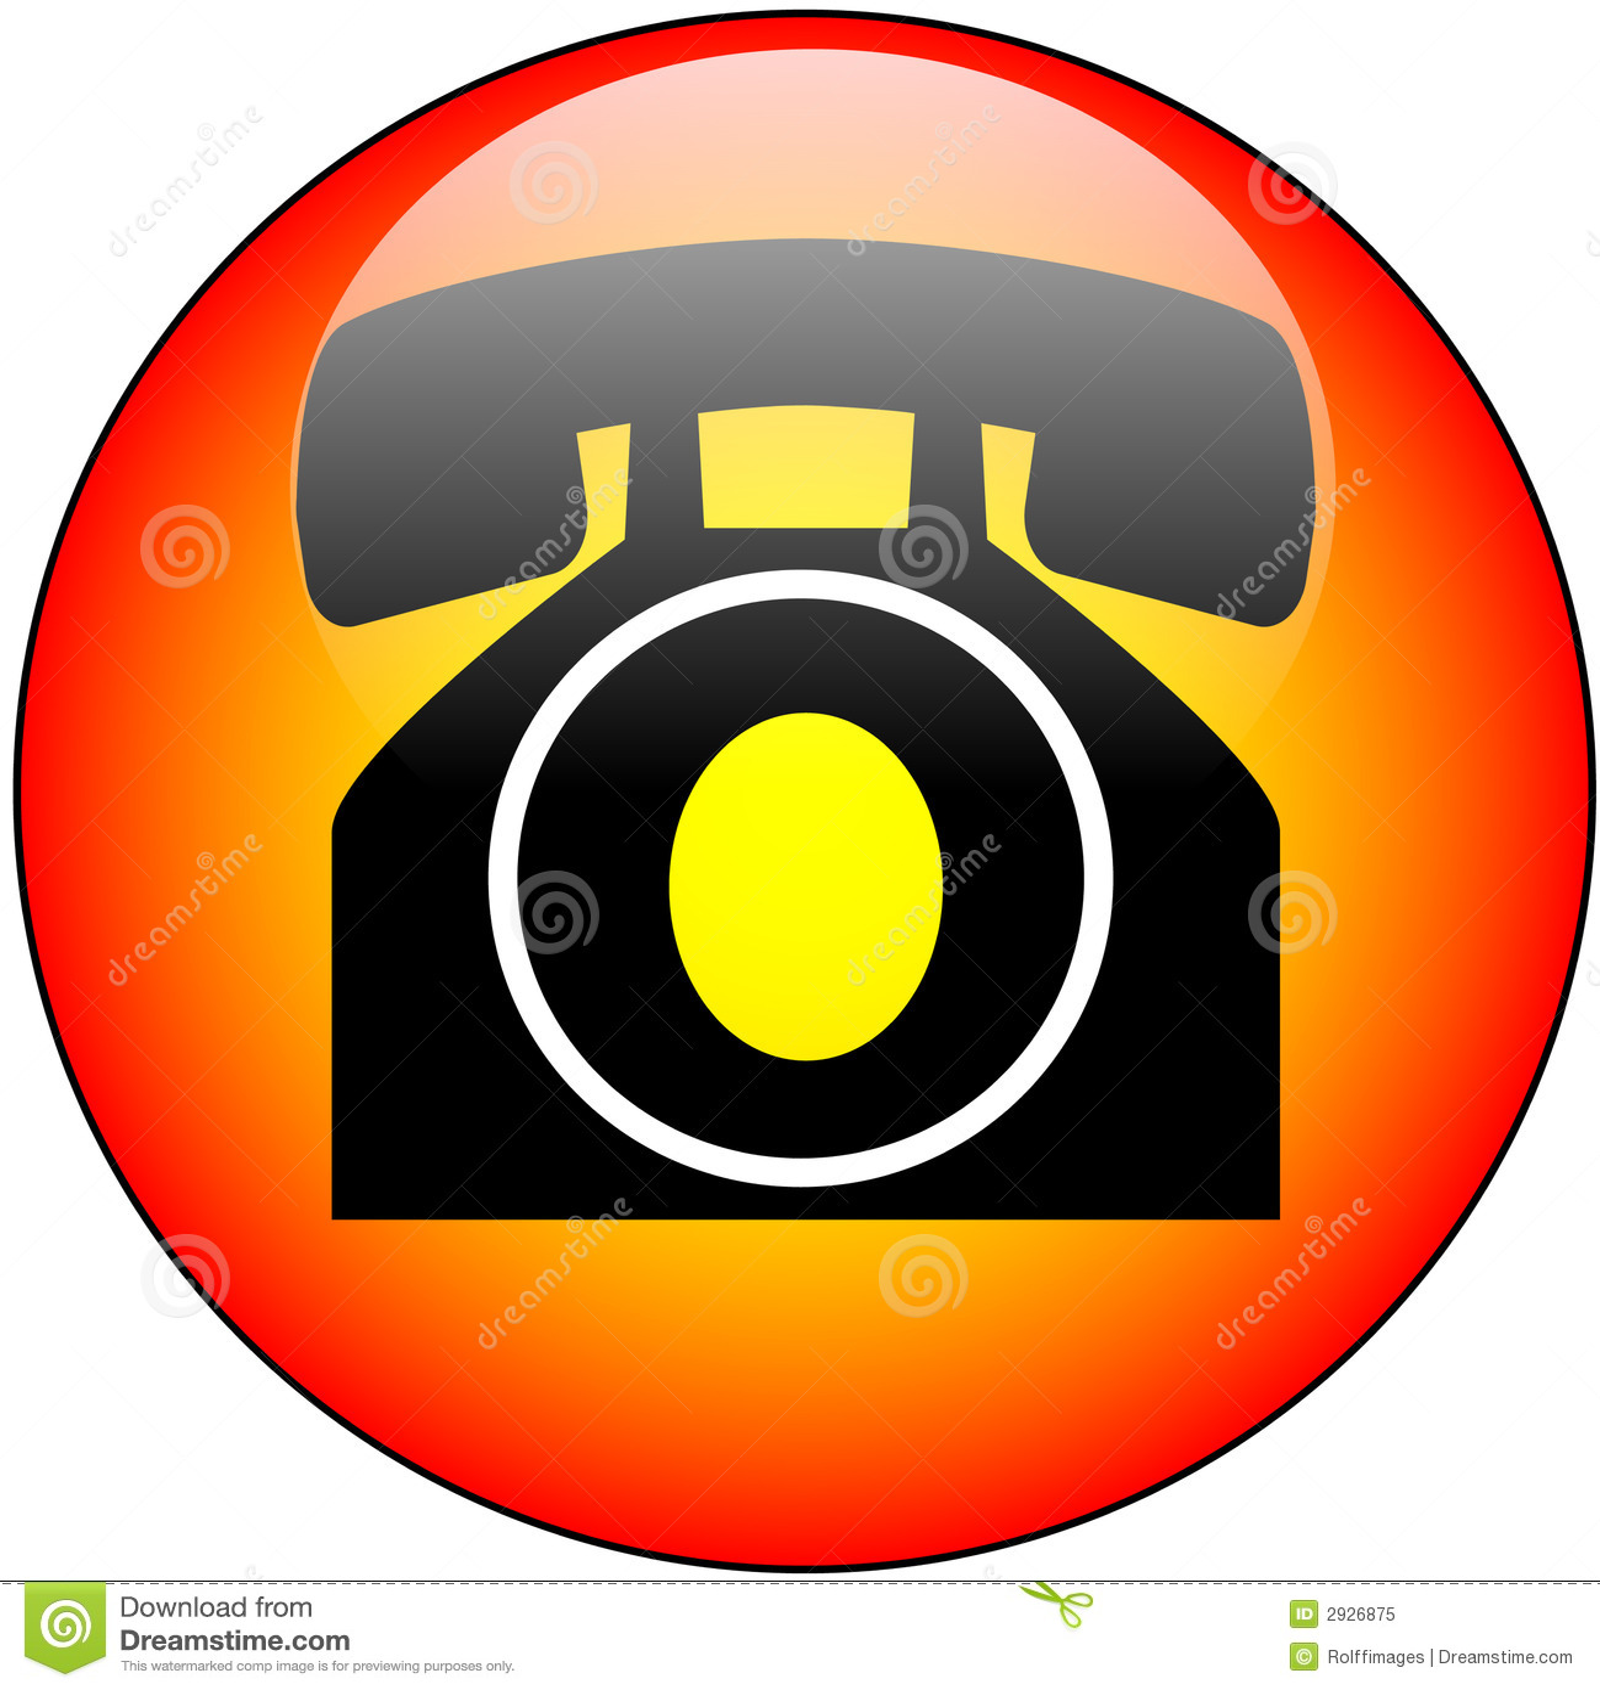 Telephone Glass Web Button